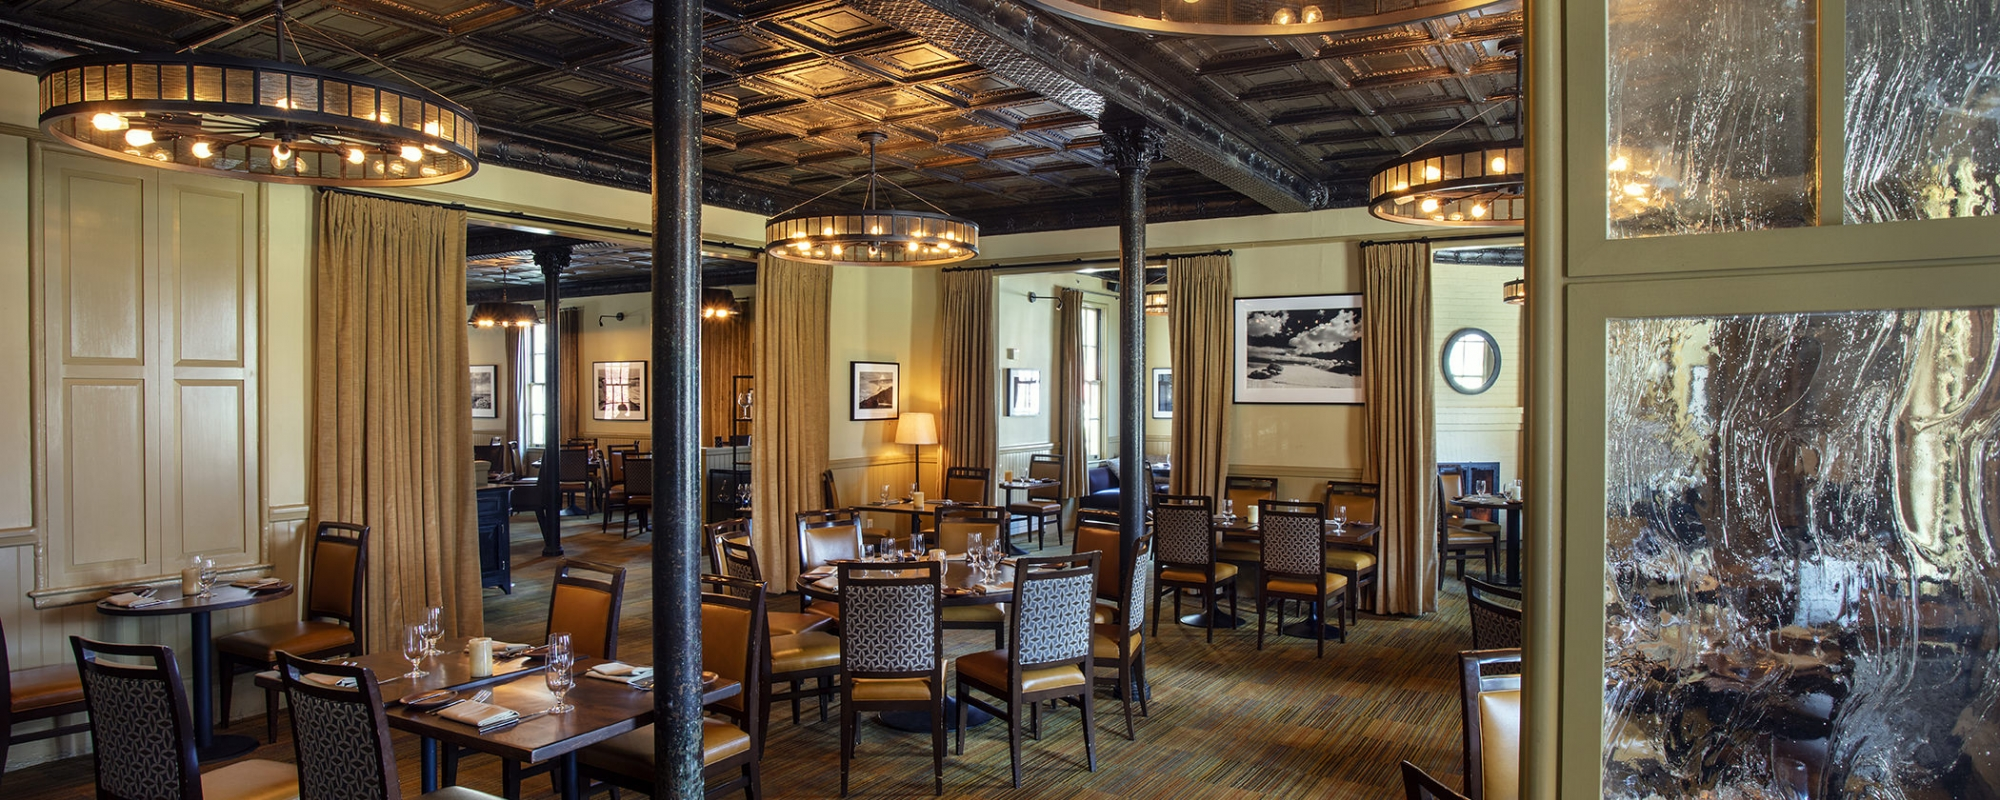 Murray Circle Restaurant Near Golden Gate Bridge Cavallo